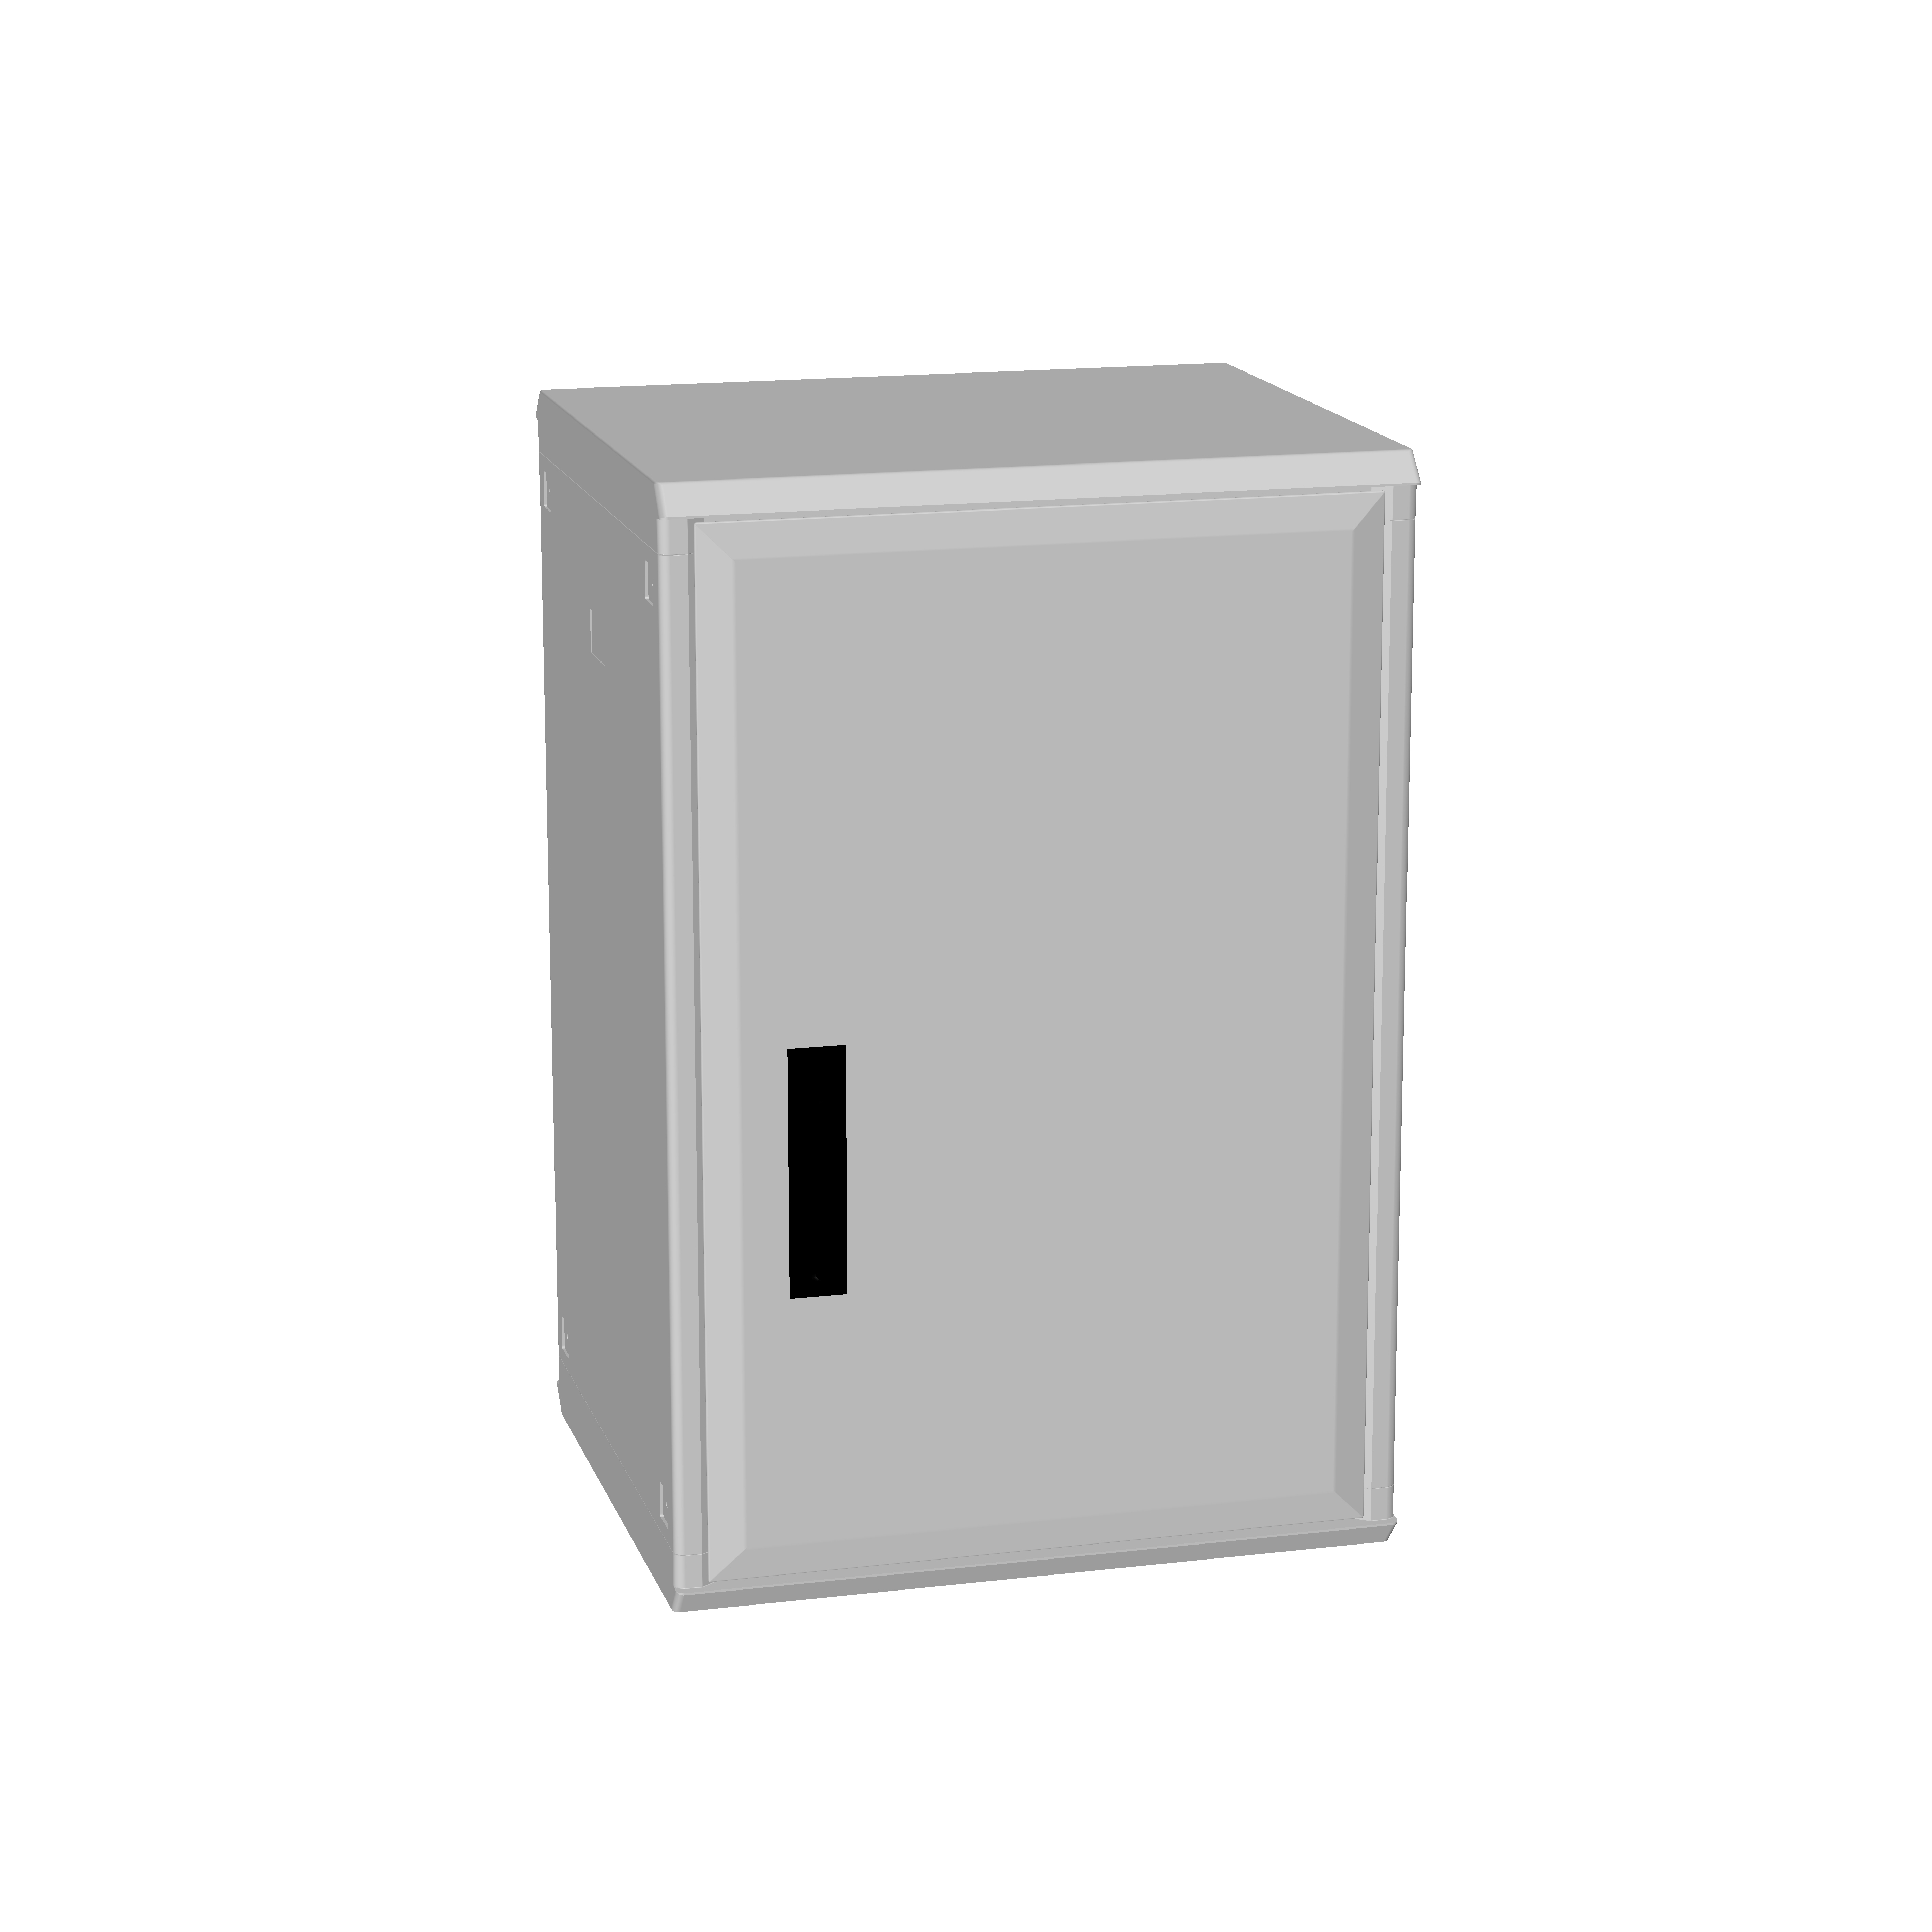 1 Stk Polyesterschrank, eintürig, 750x500x432 POCC3240--